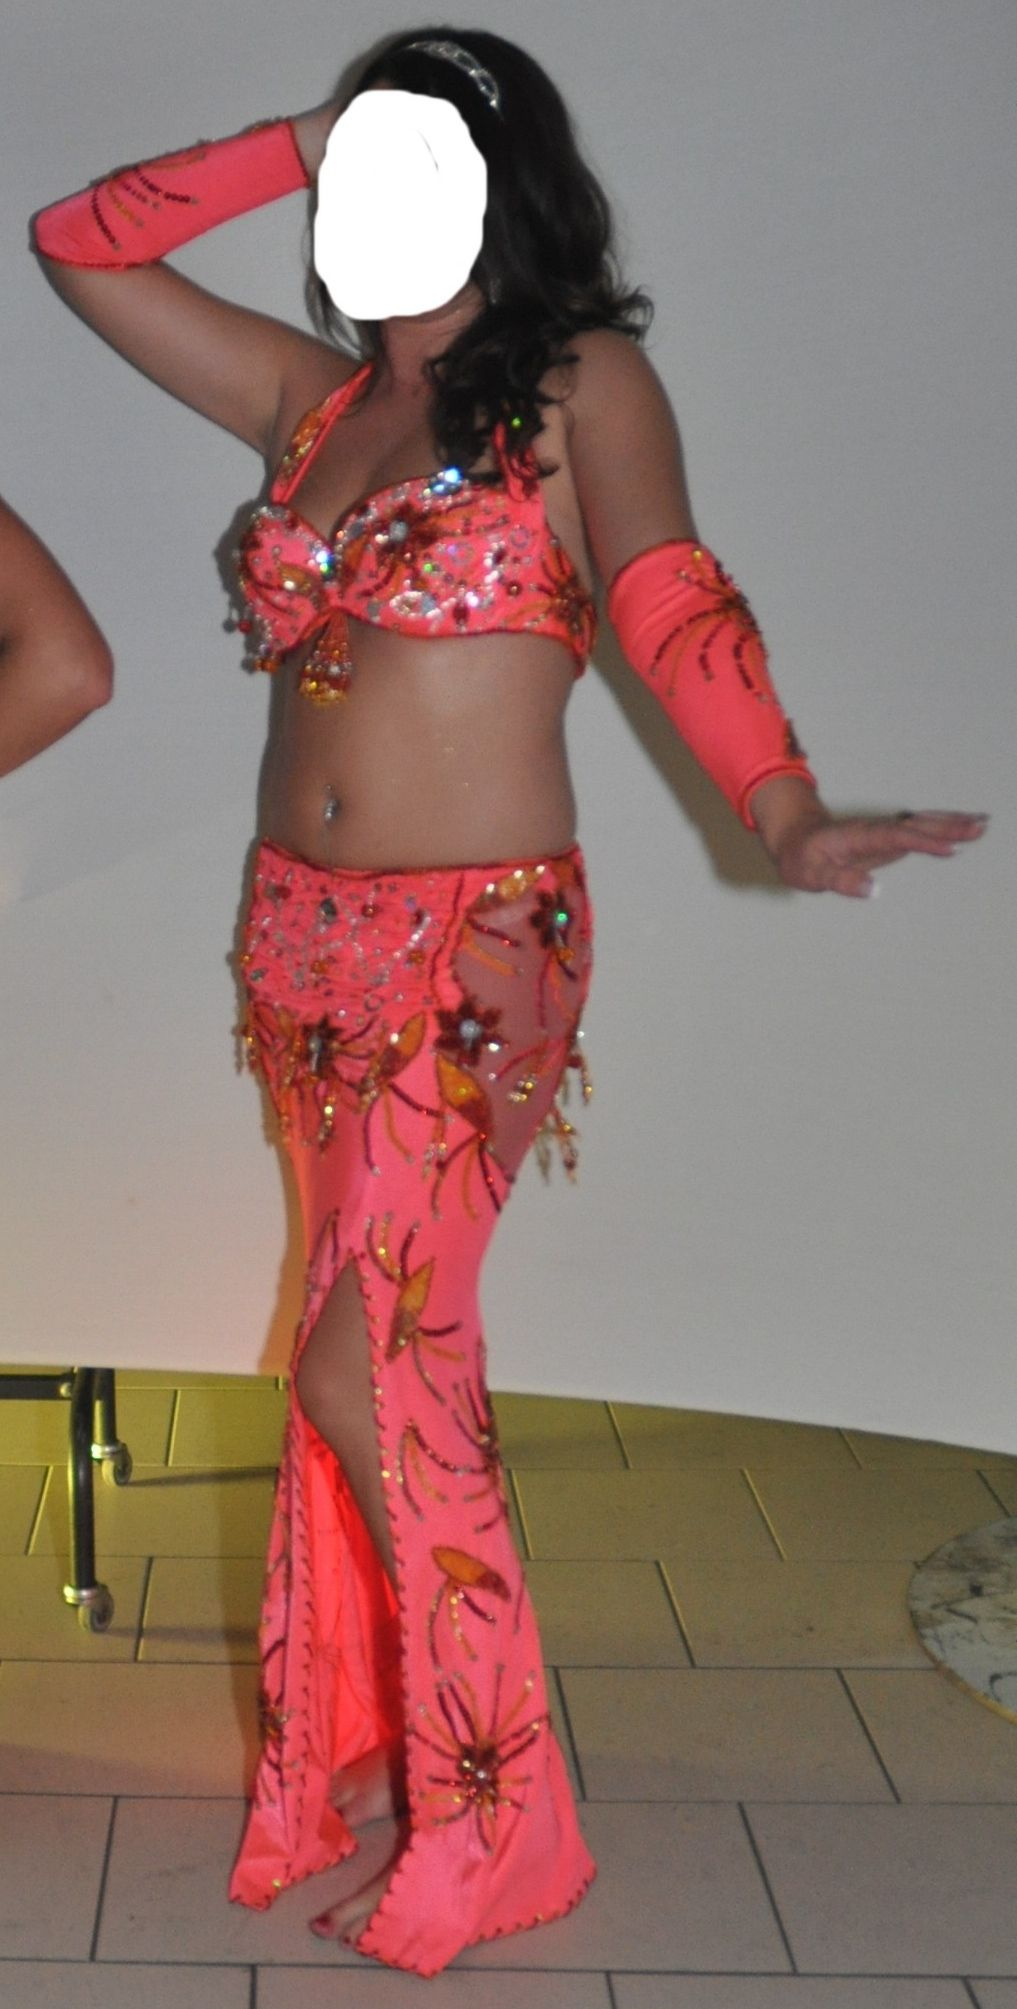 e30ad0c798c007 Costume danse orientale Orange Flash - Iman Danse Orientale ...